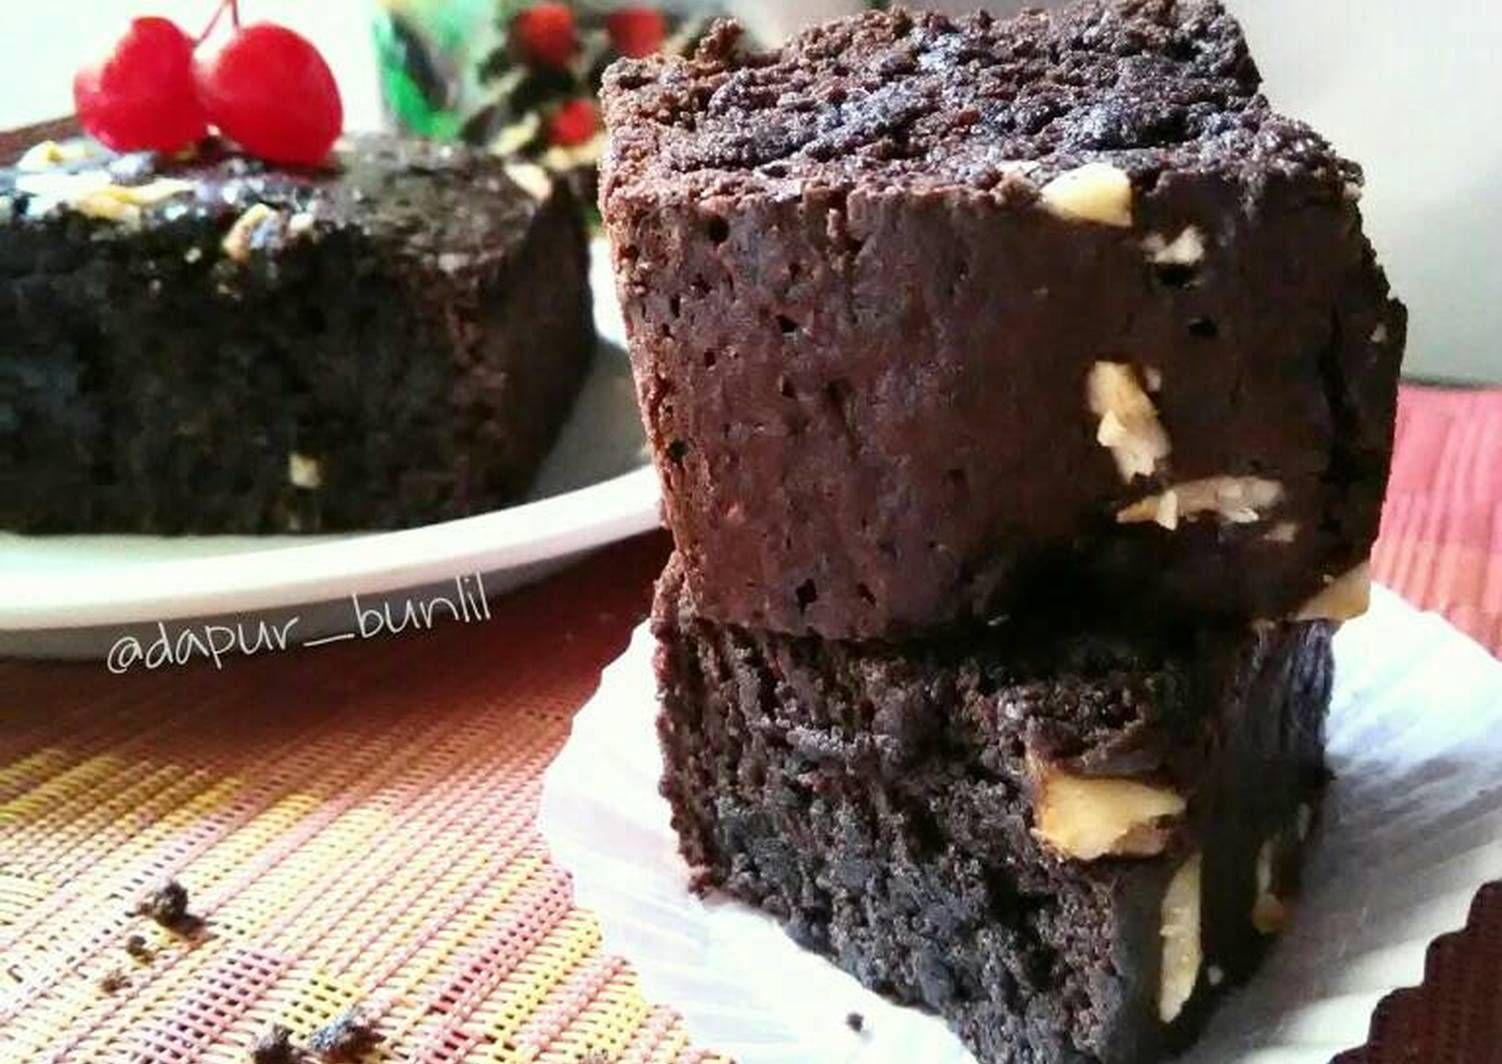 Resep Brownies Tepung Singkong Brownies Mocaf Oleh Lila W Lestari Resep Tepung Brownies Adonan